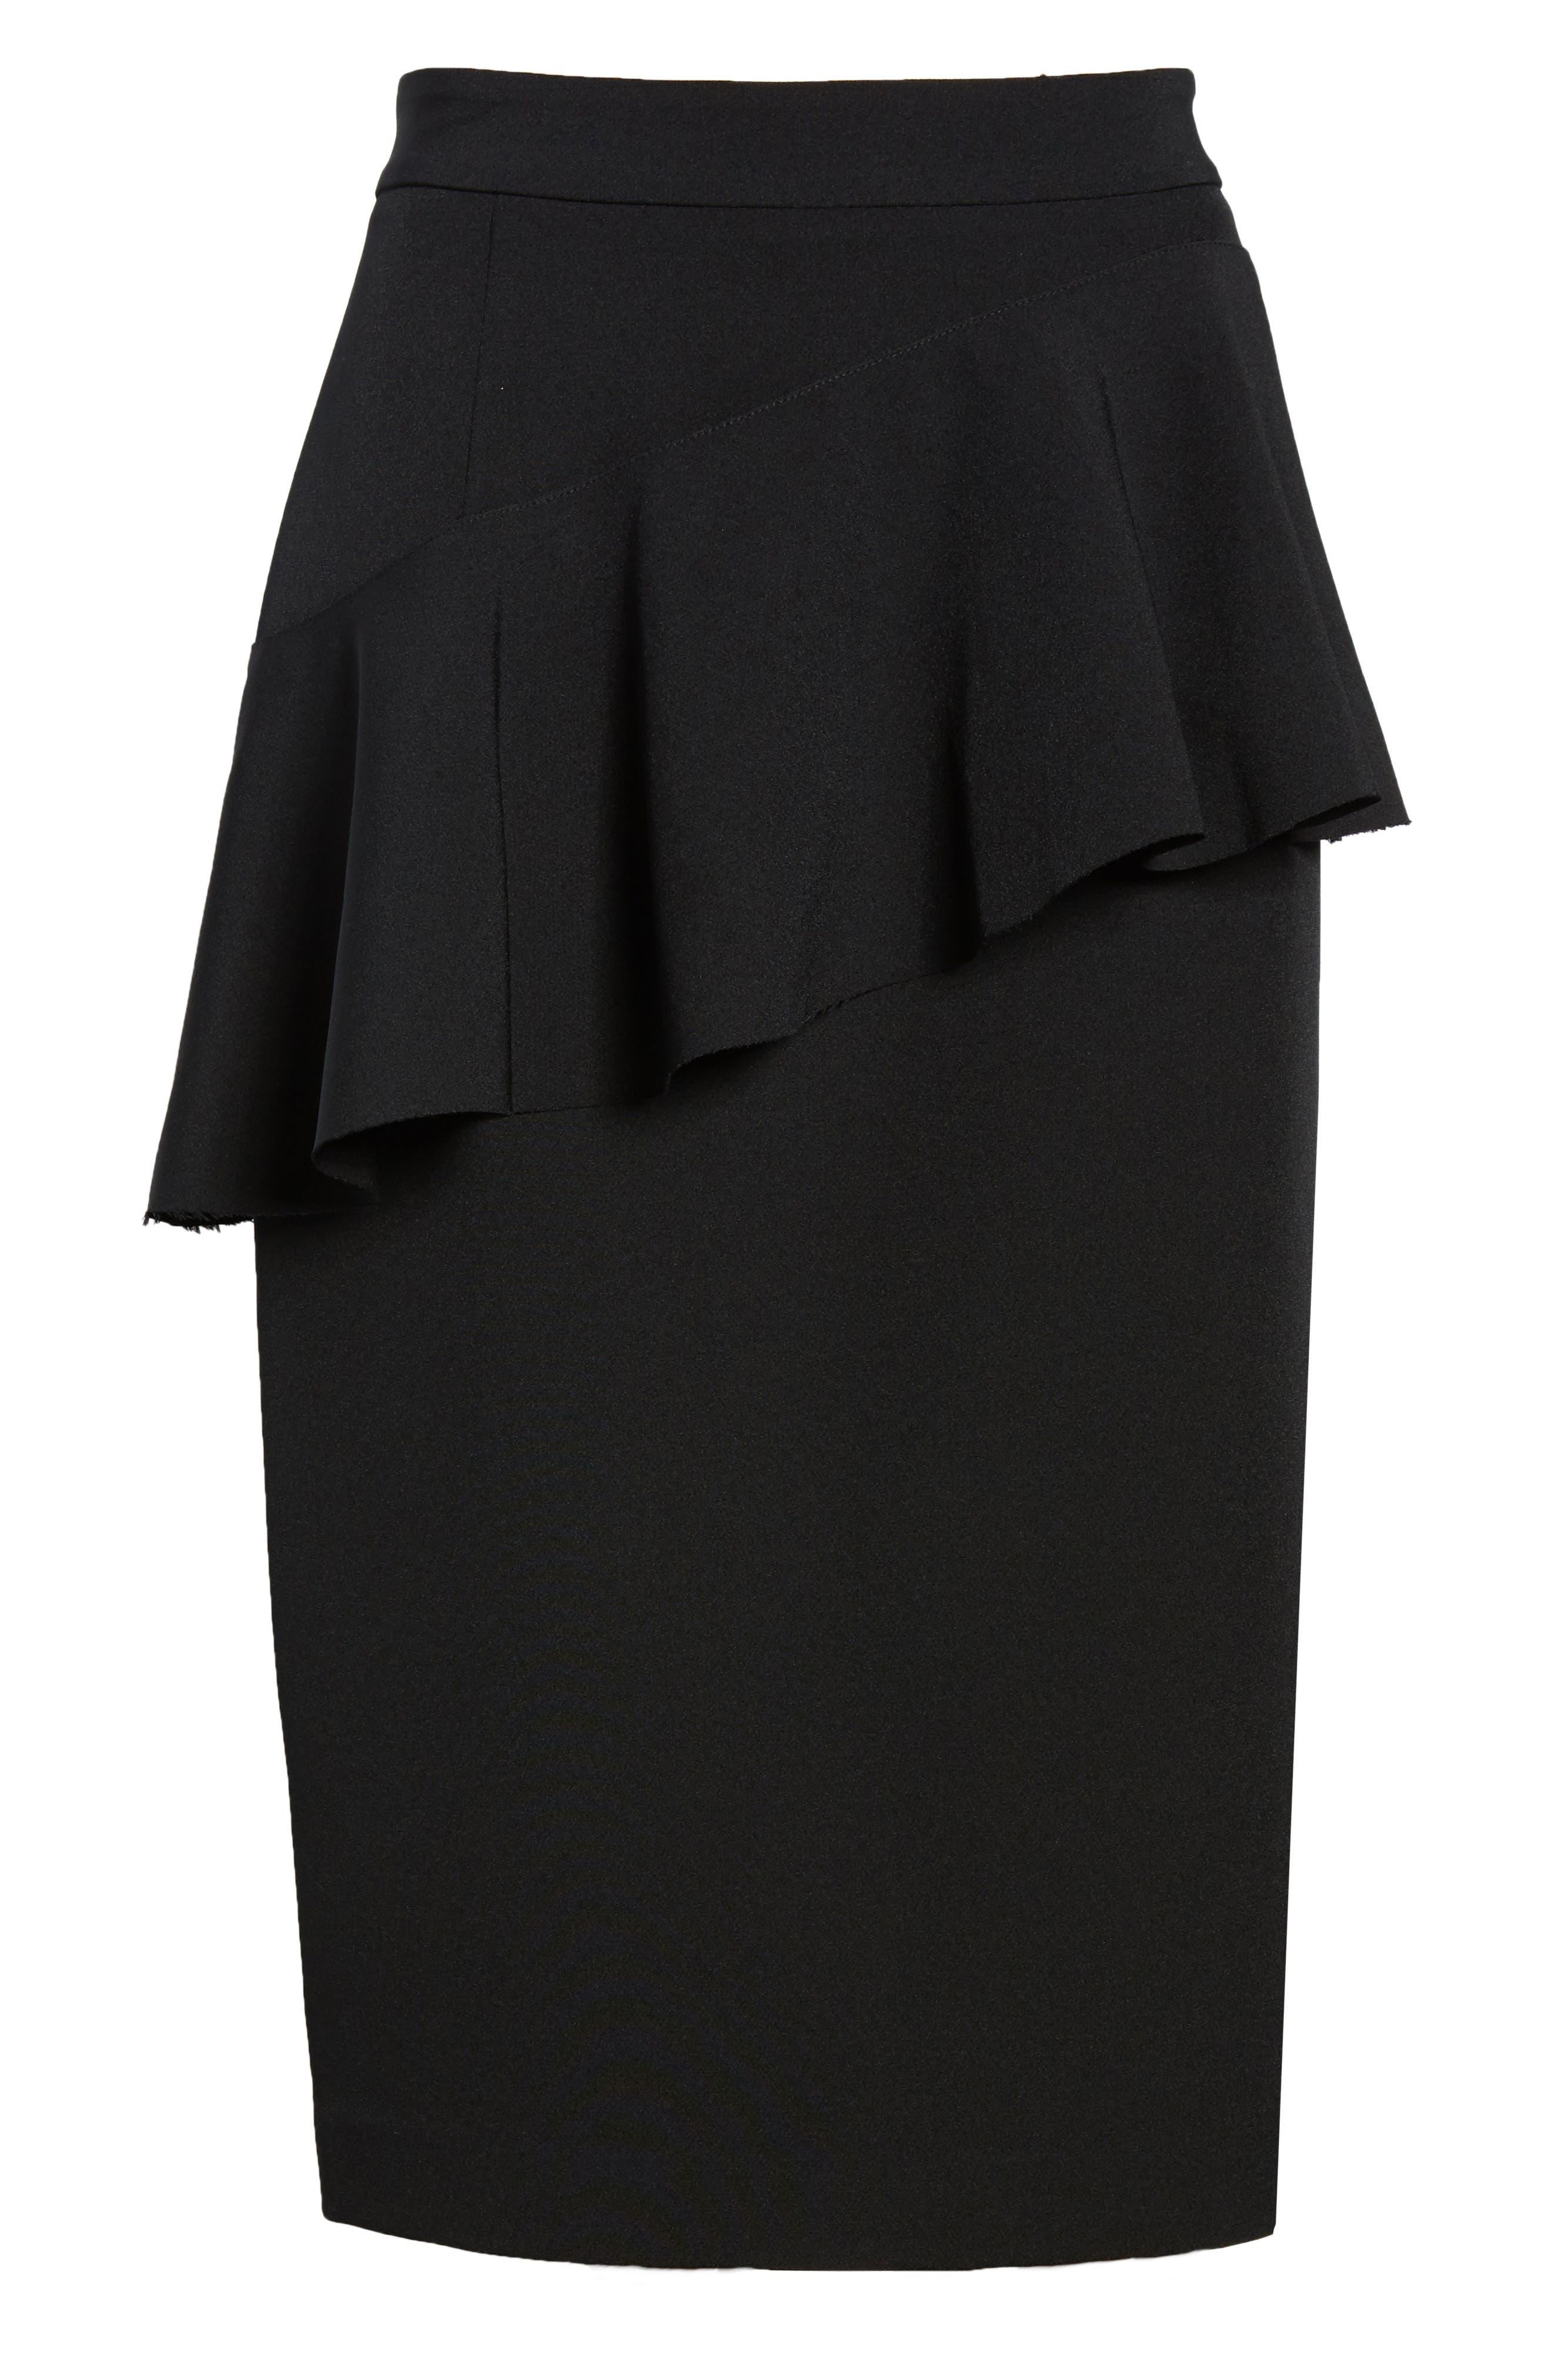 Ruffle Detail Pencil Skirt,                             Alternate thumbnail 6, color,                             001